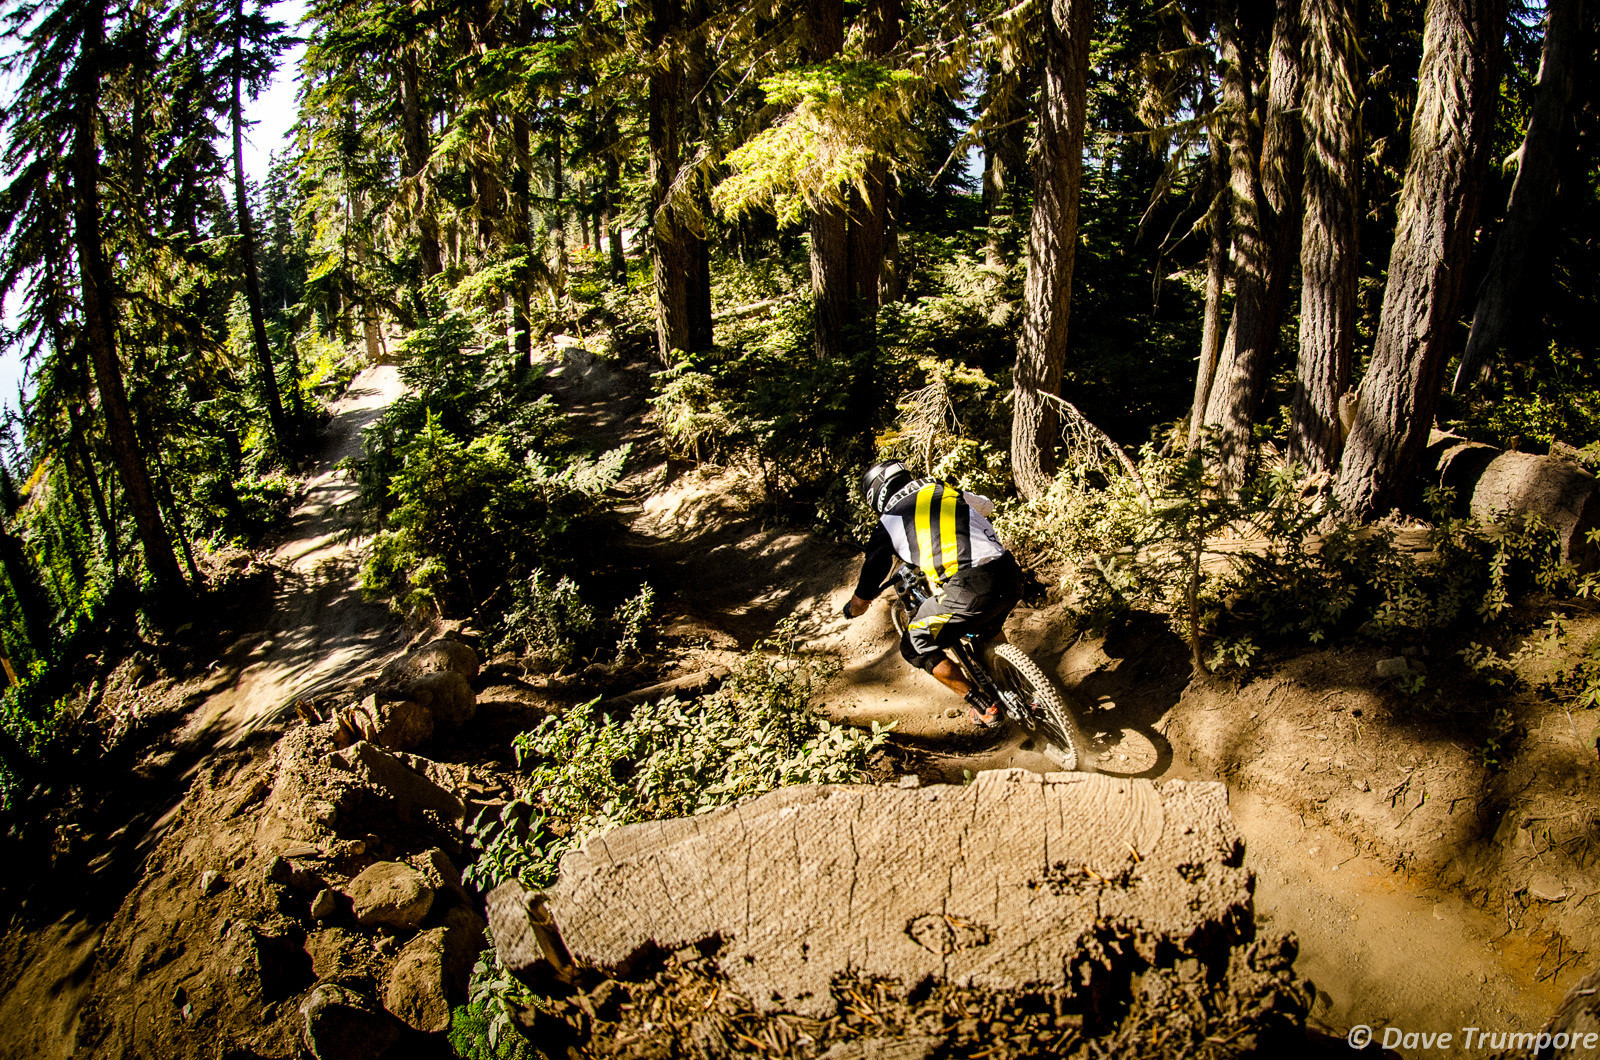 Adam Craig Crankworx Garbanzo DH - Crankworx Whistler Garbanzo DH - Mountain Biking Pictures - Vital MTB